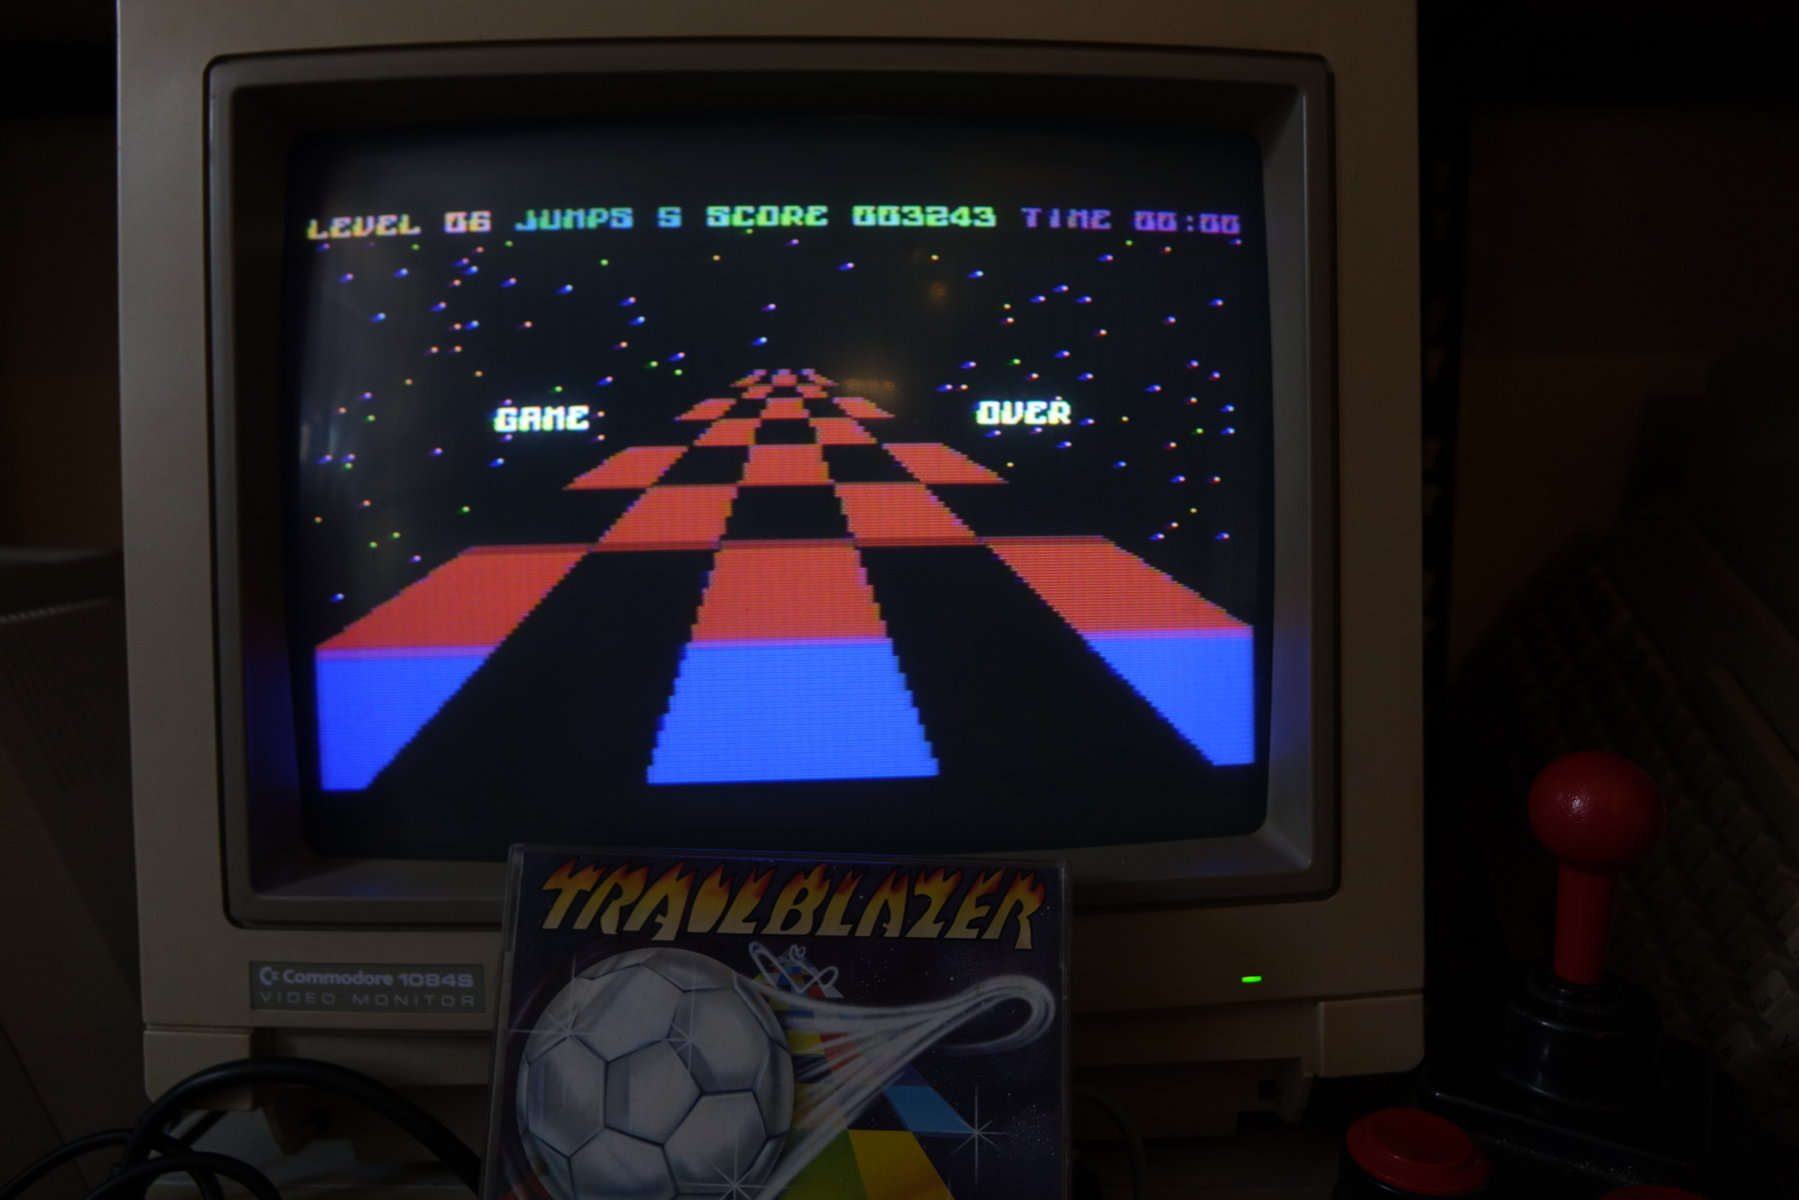 plus4punk: Trailblazer (Commodore 16/Plus4) 3,243 points on 2020-04-14 12:22:00